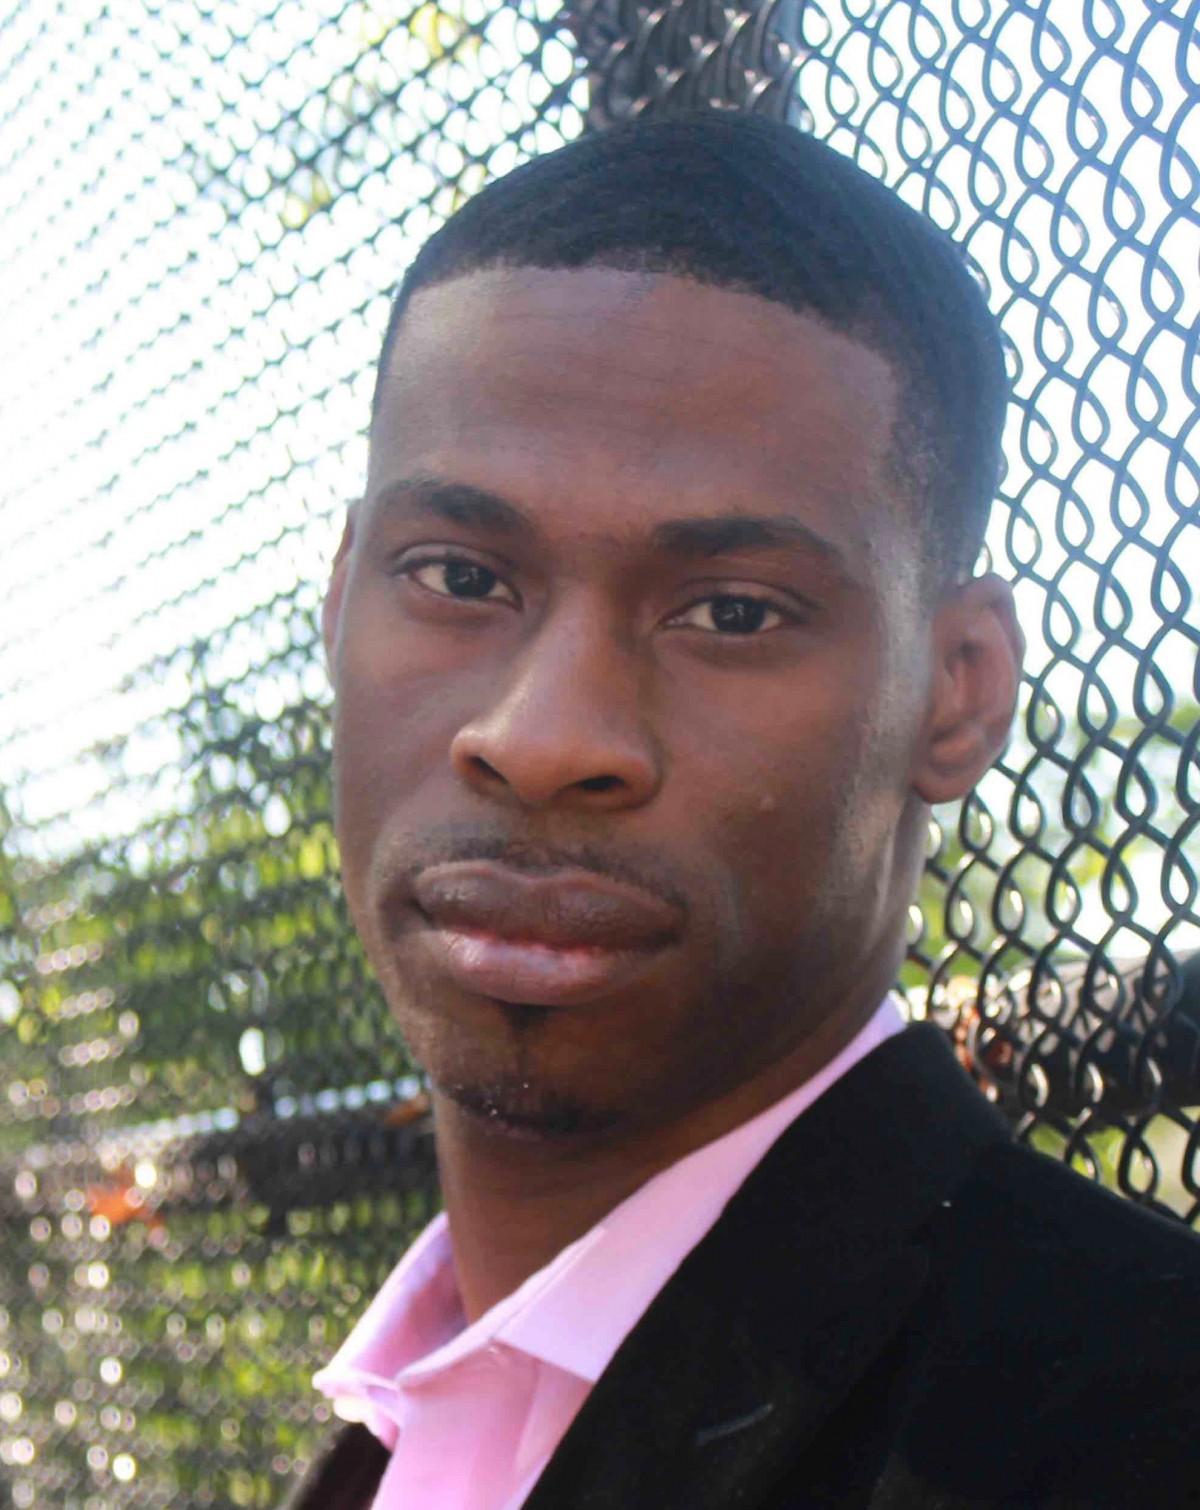 Marlon Peterson